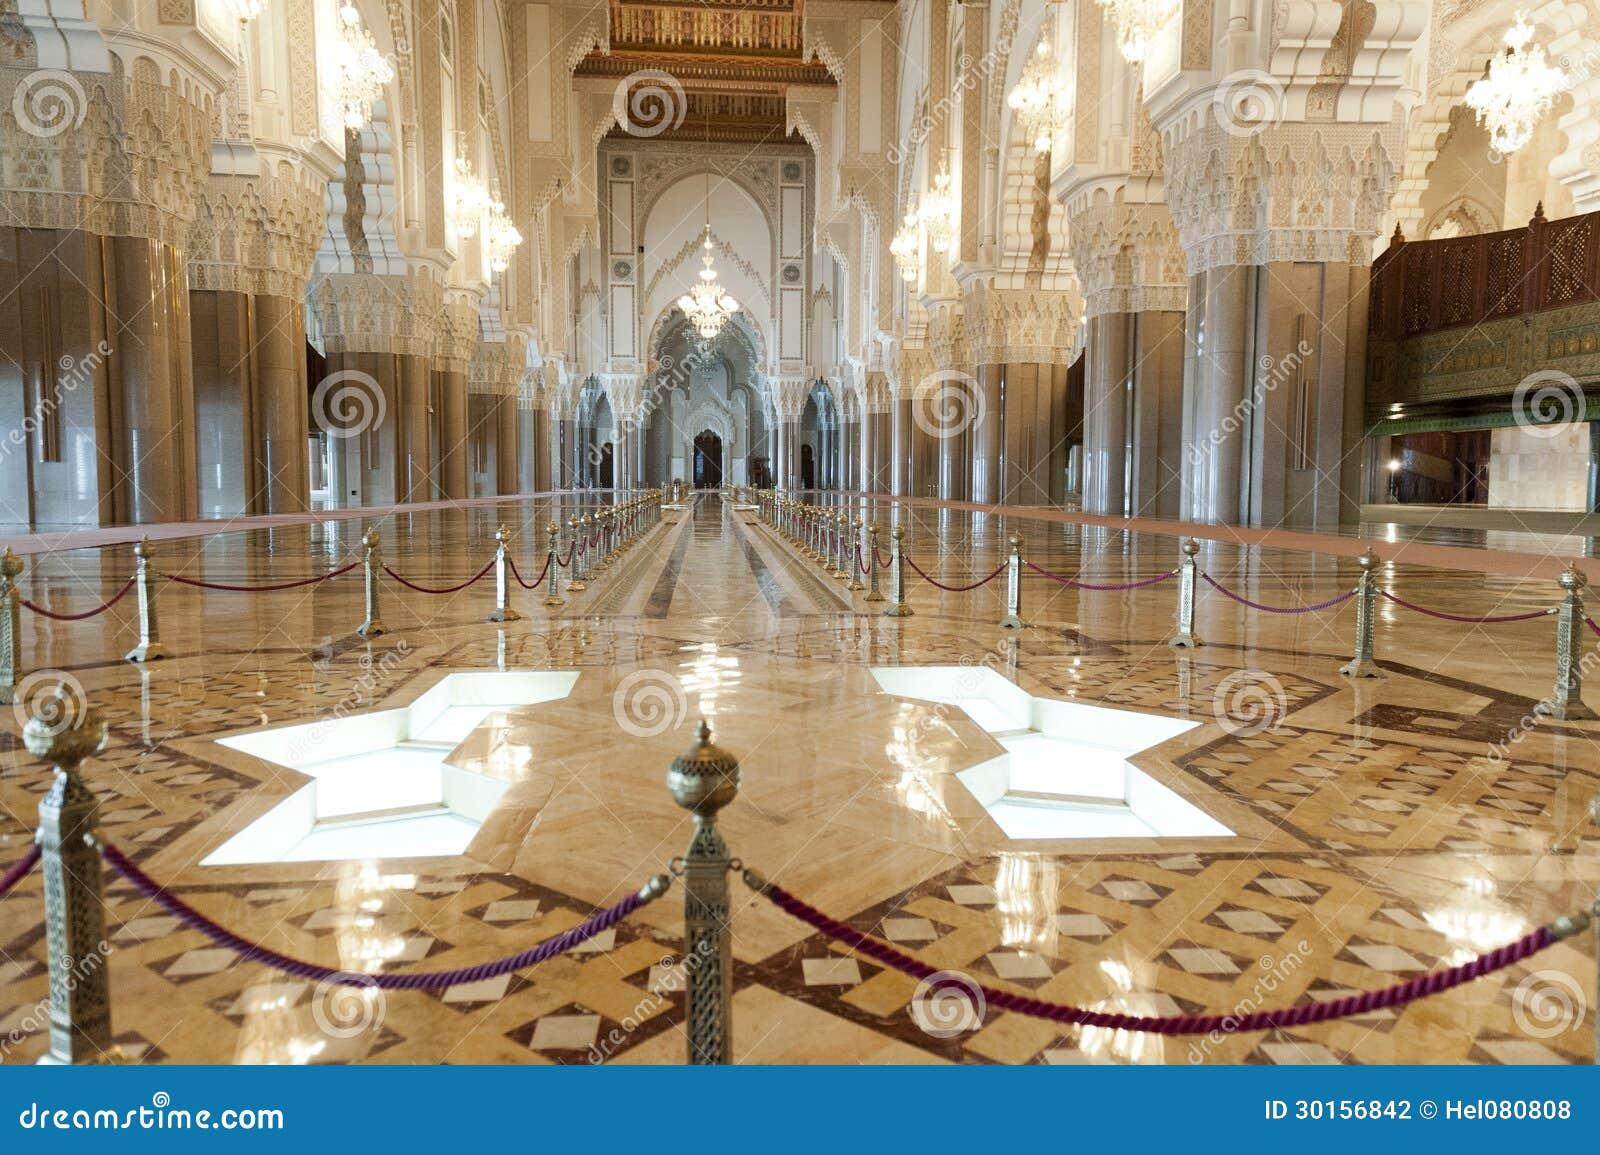 Mosqu e du roi hassan ii casablanca maroc for Mosquee hassan 2 interieur